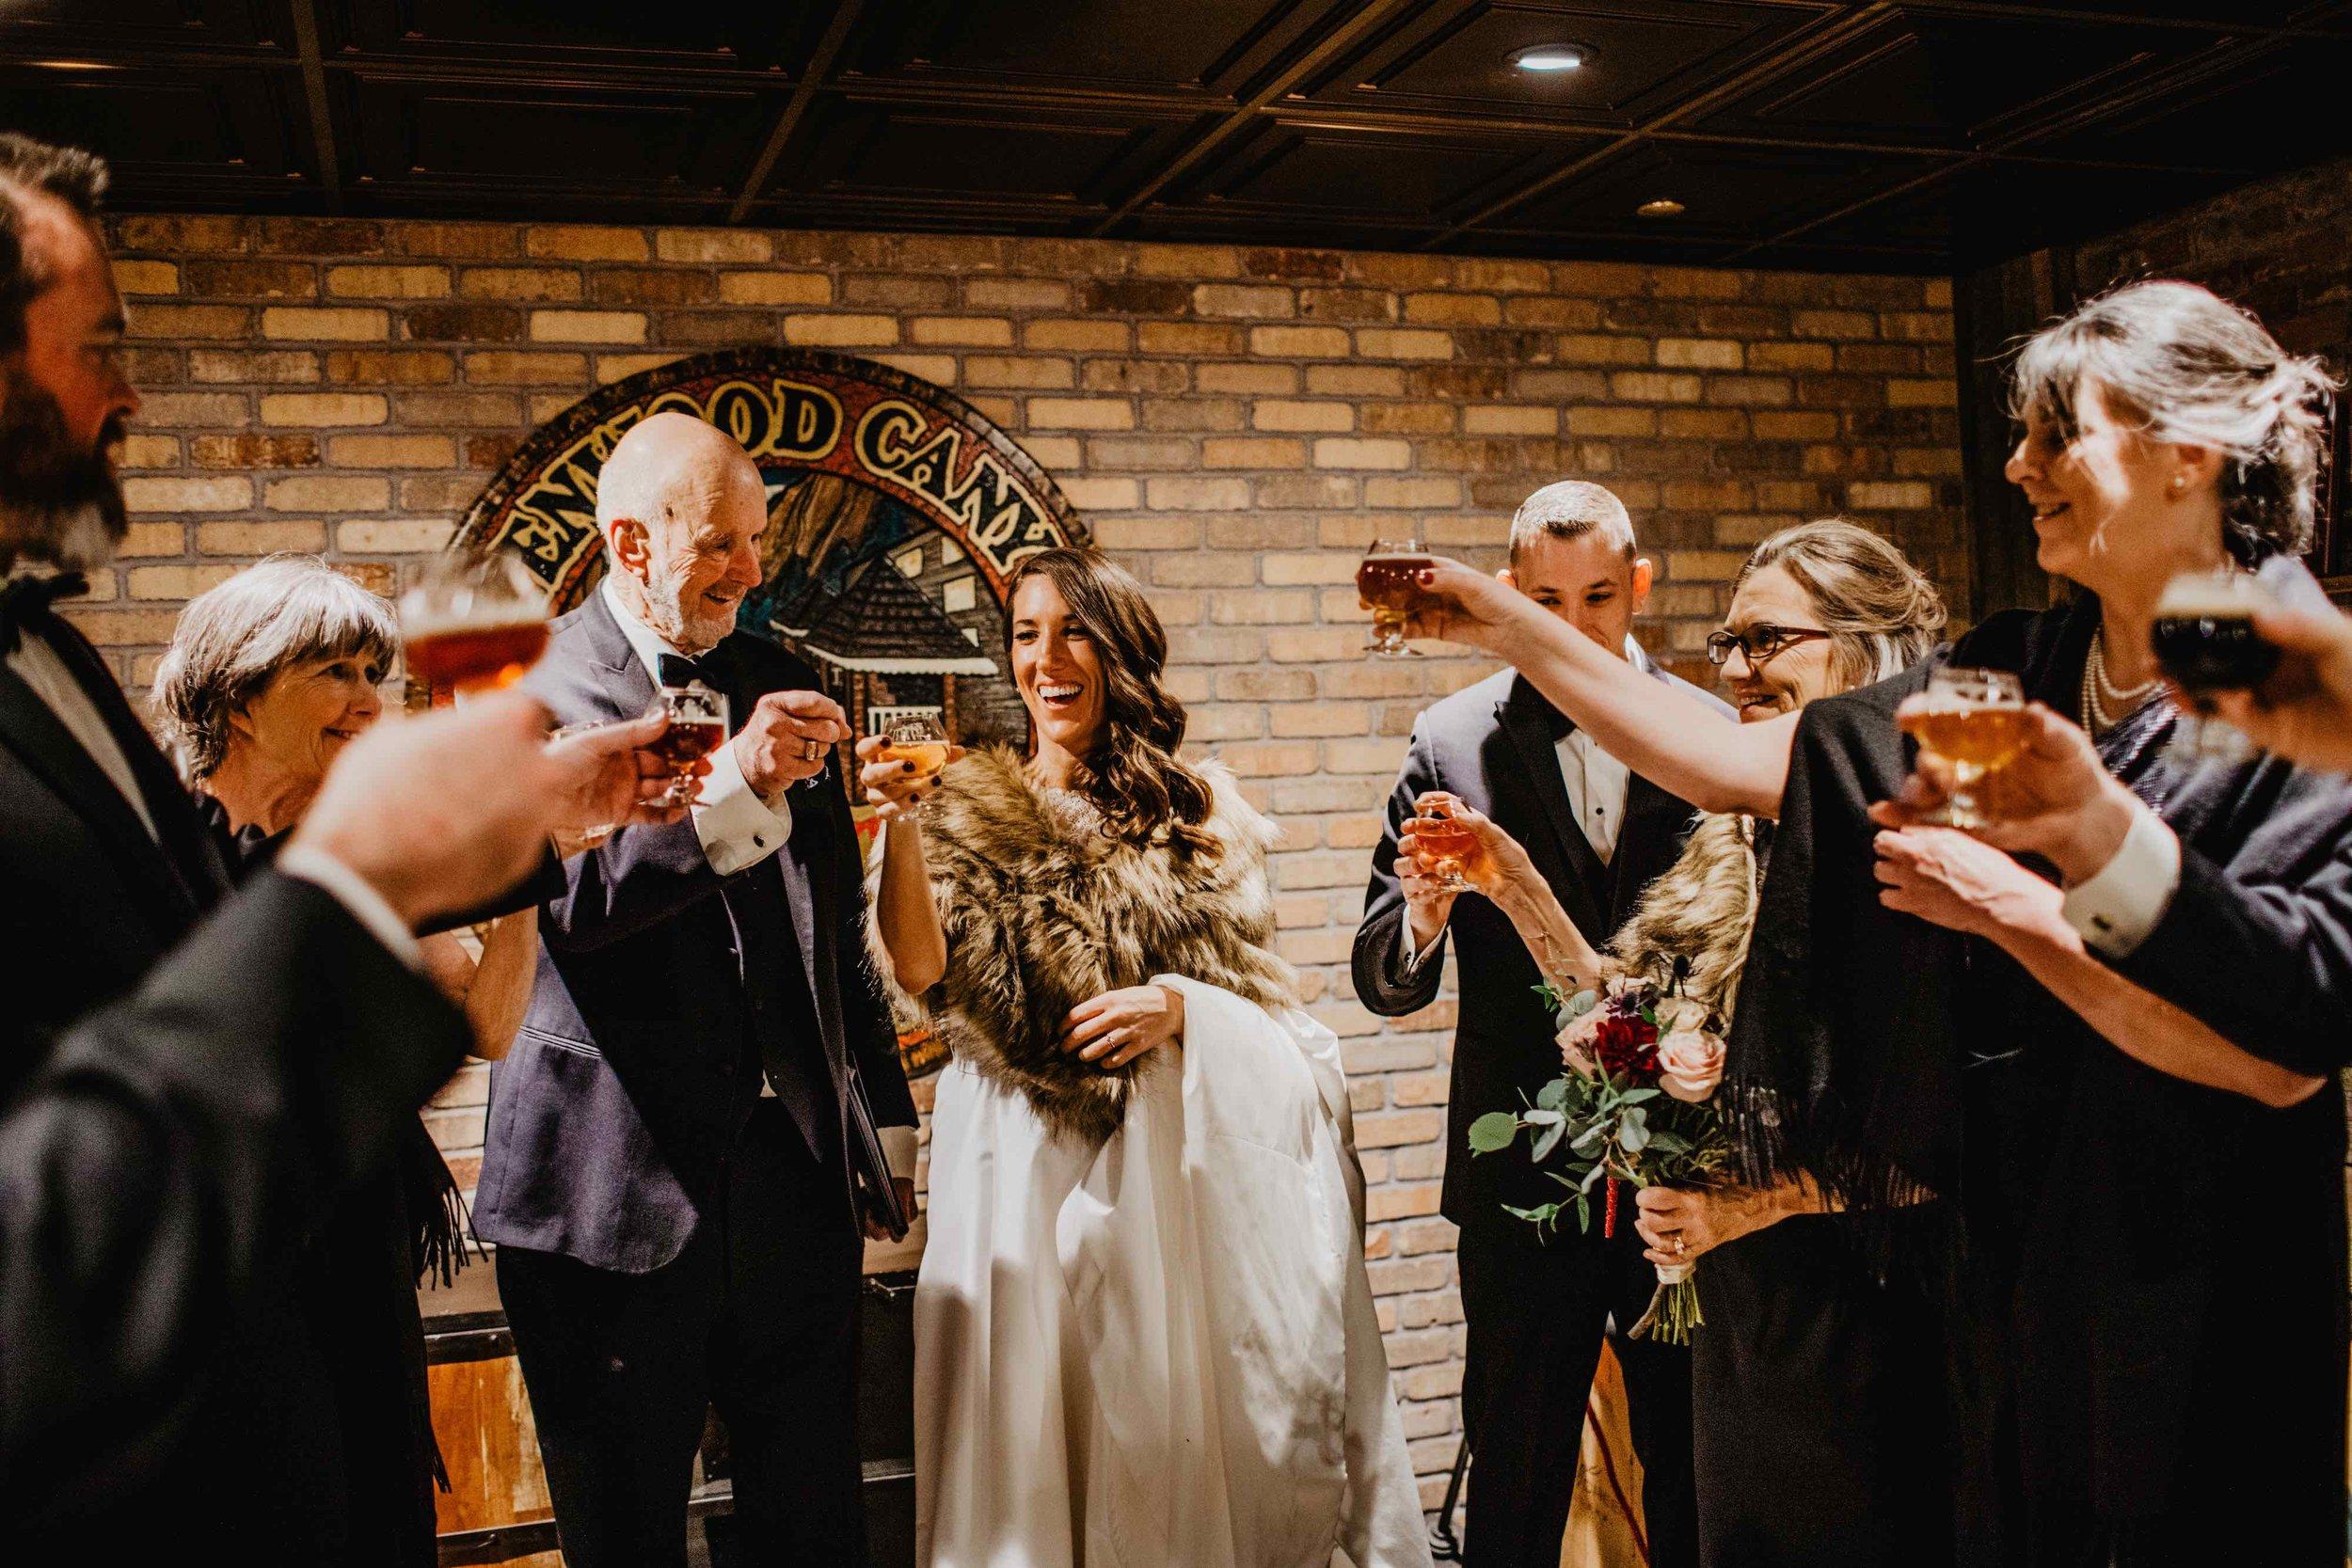 Kisa Conrad Favorites-0029-colorado-wedding-photographer-denver-springs-vailhotel-glenwood-springs-colorado-wedding-photographer.jpeg